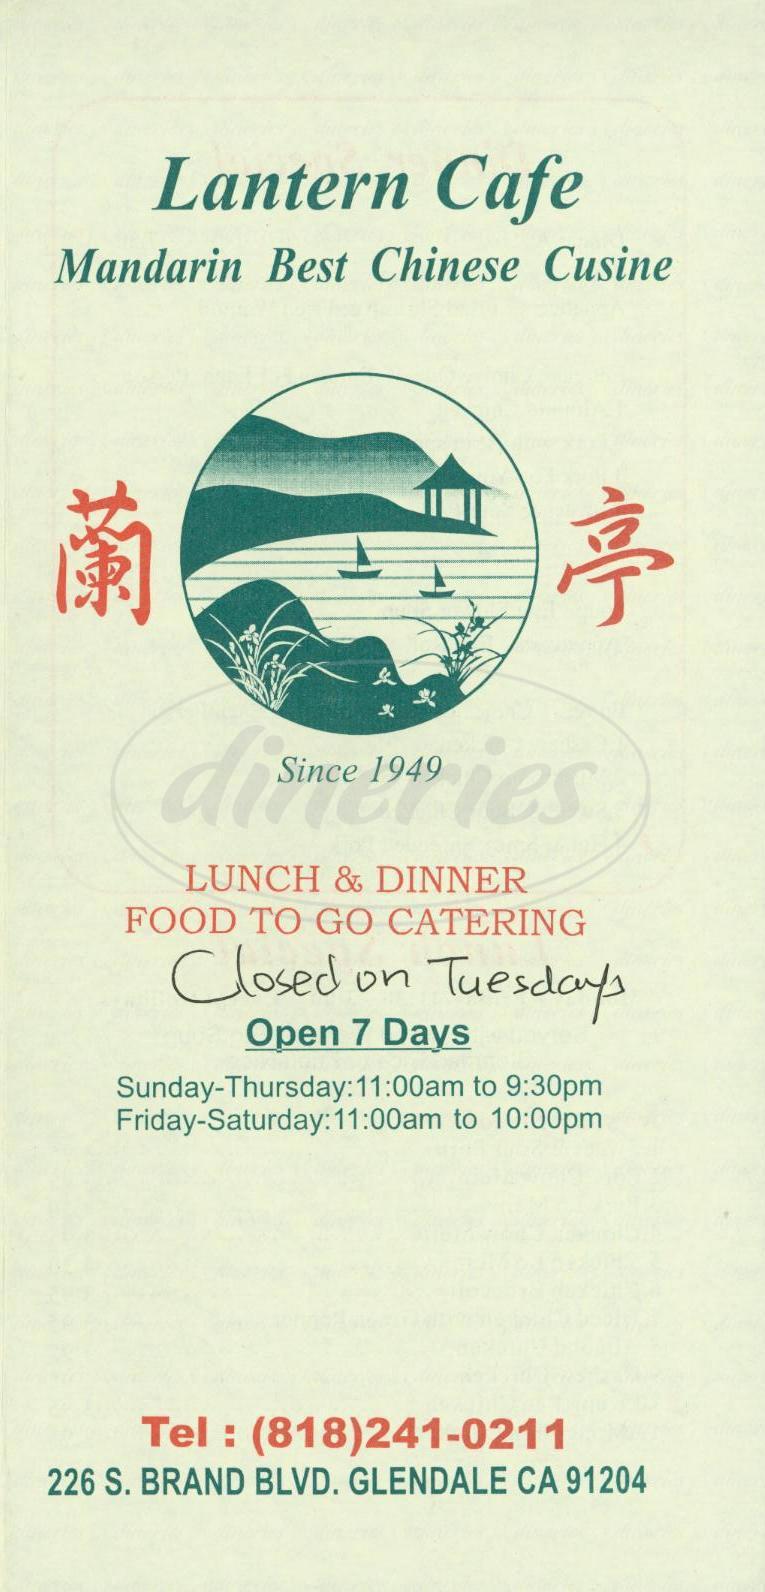 menu for Lantern Café